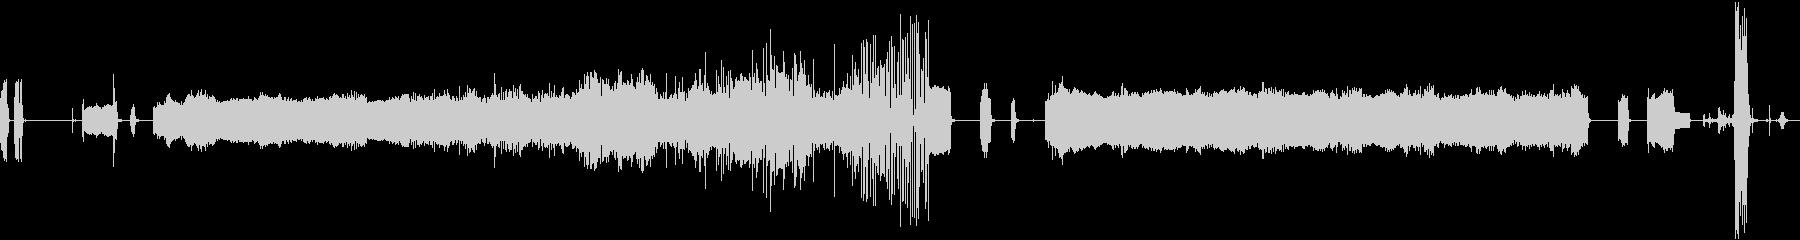 FAXマシン、小規模バージョン、受...の未再生の波形